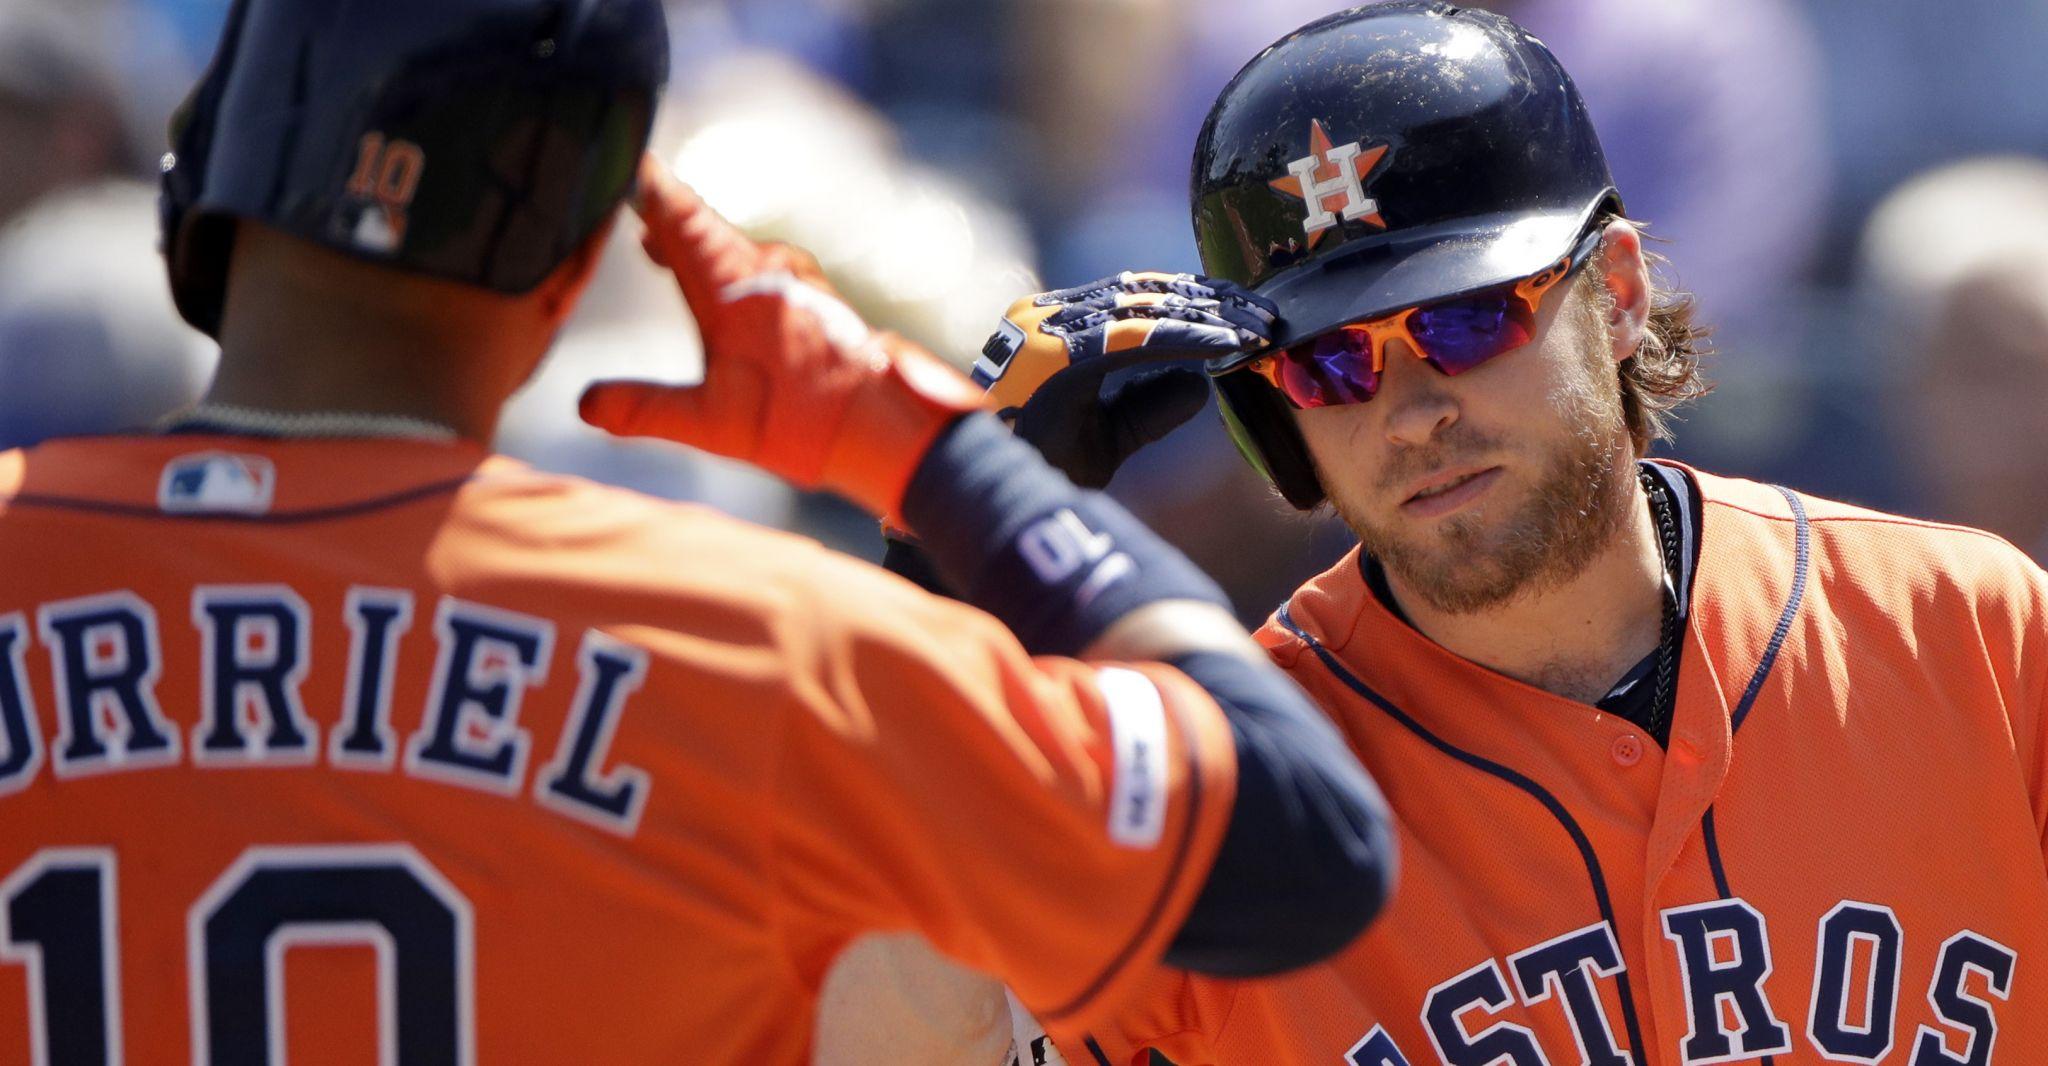 Astros blast Royals to cap sweep